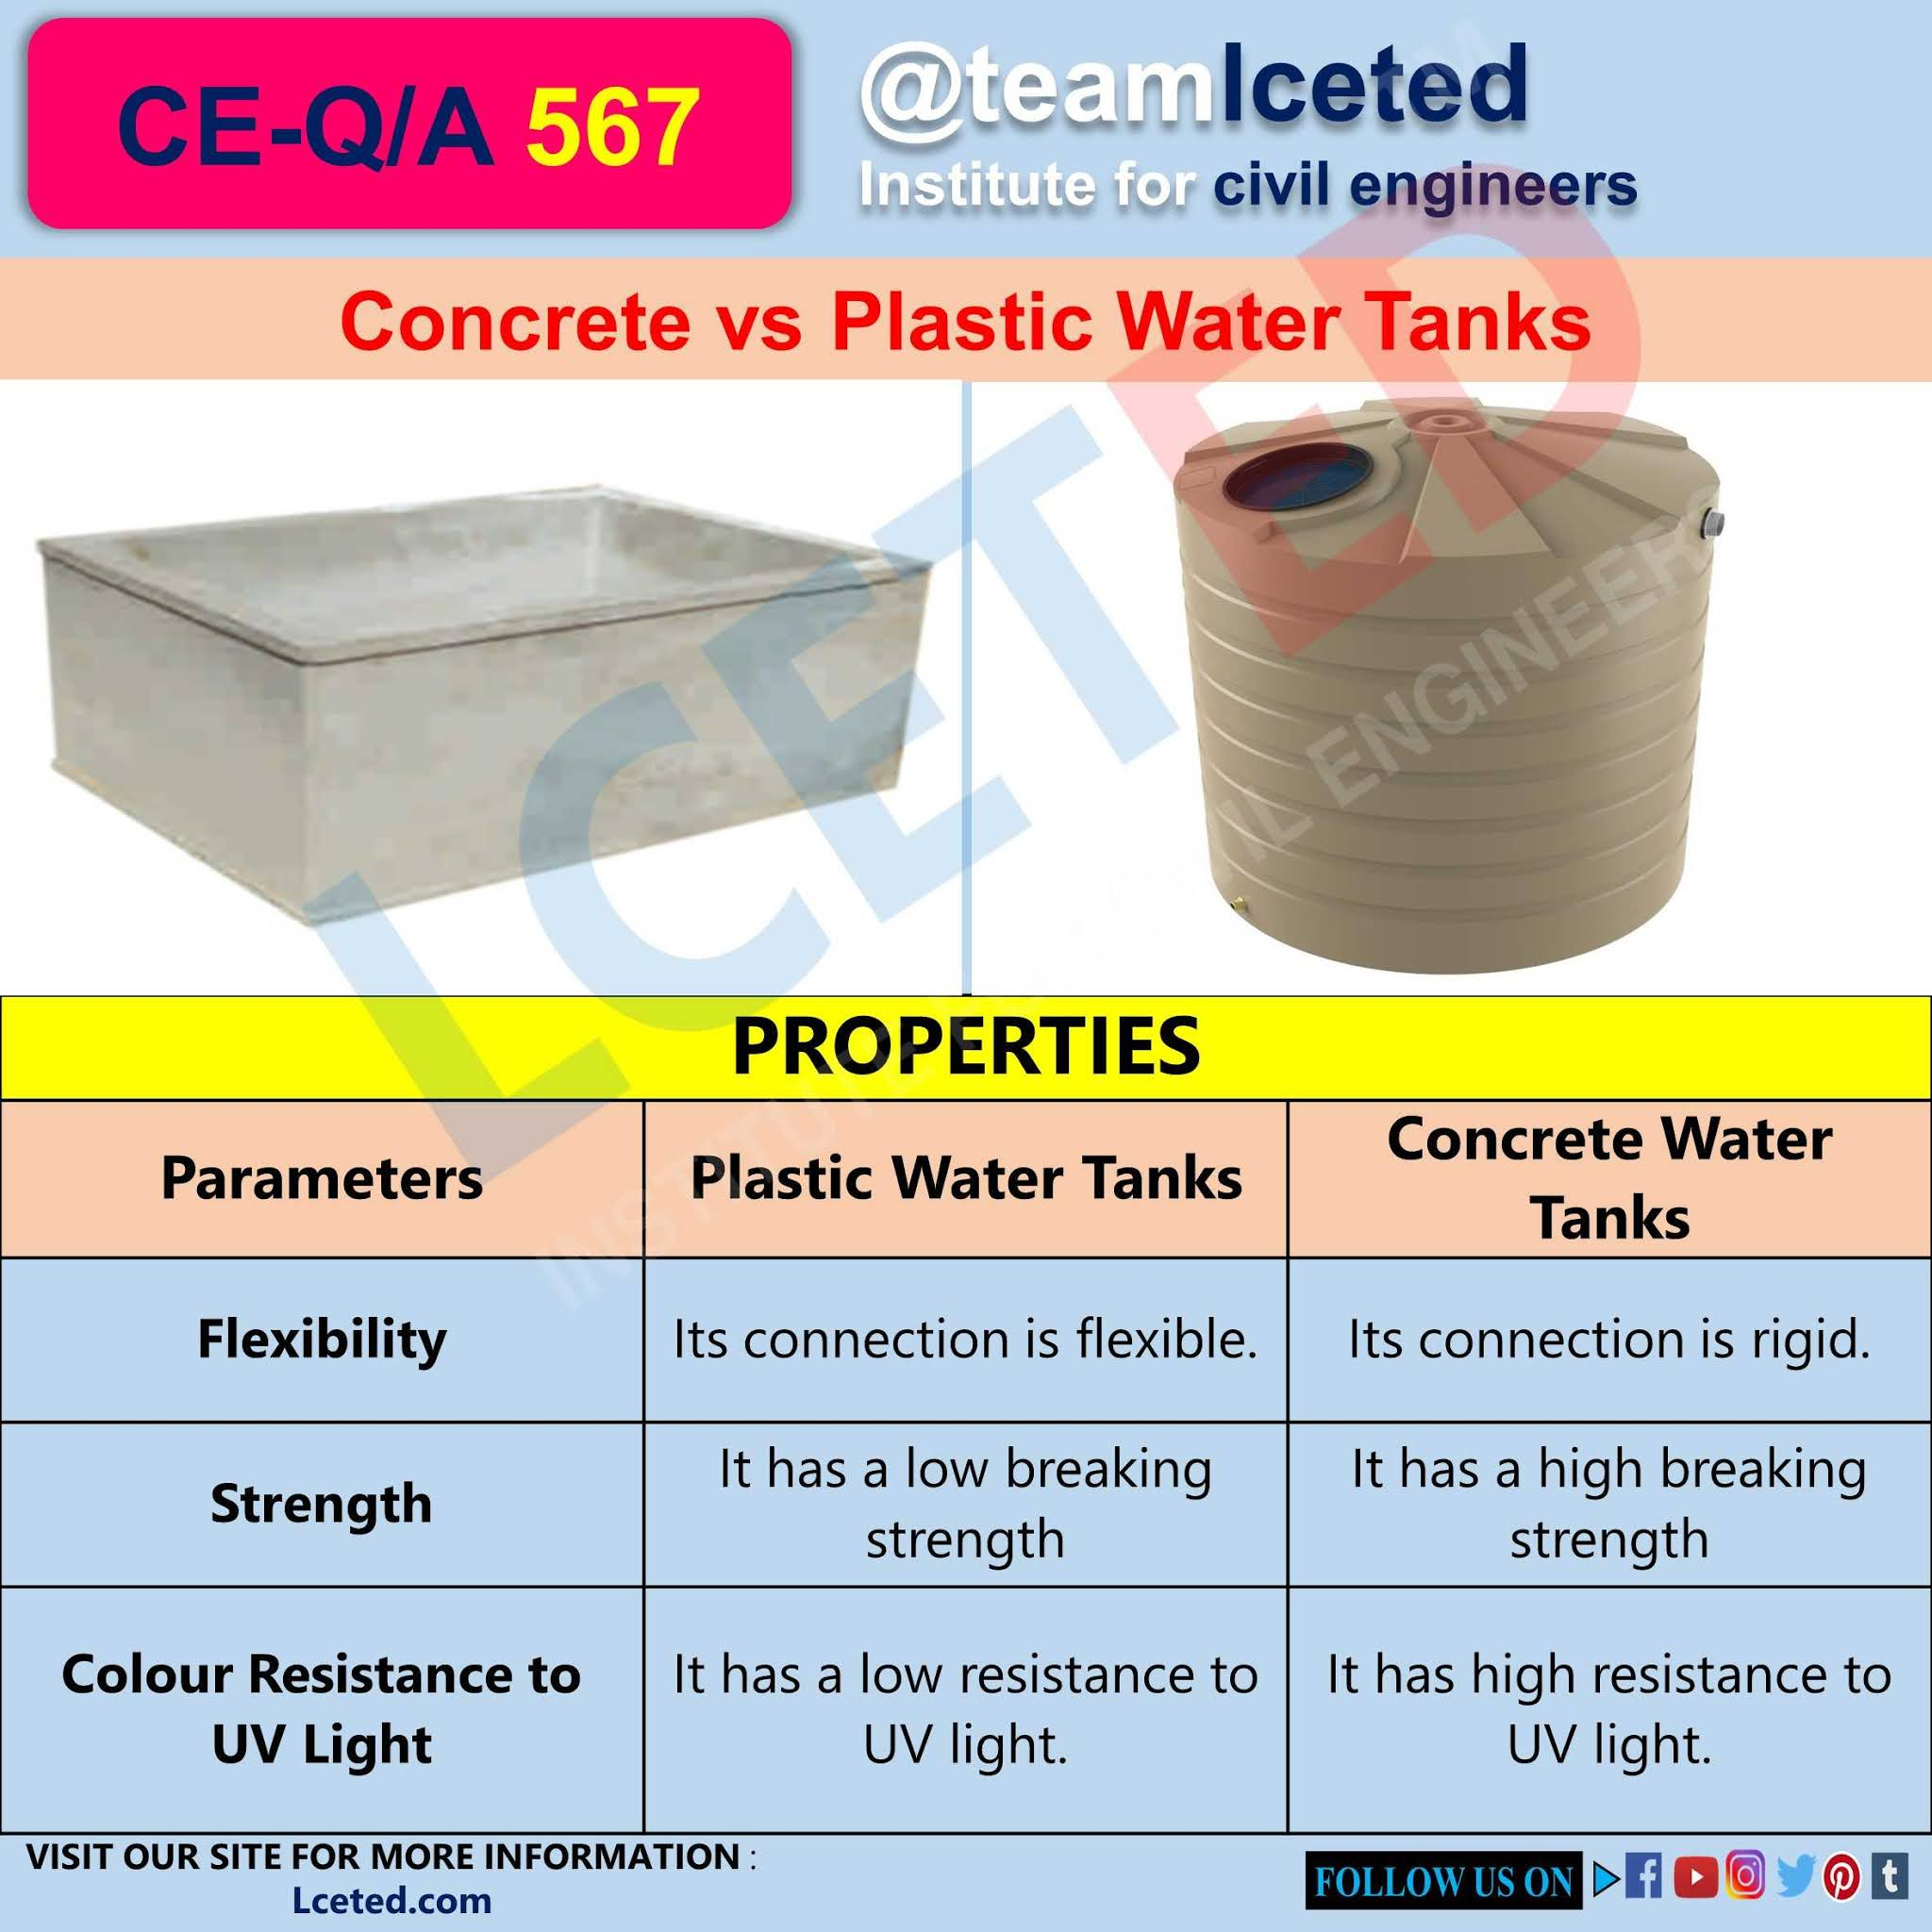 Concrete vs Plastic Water Tanks